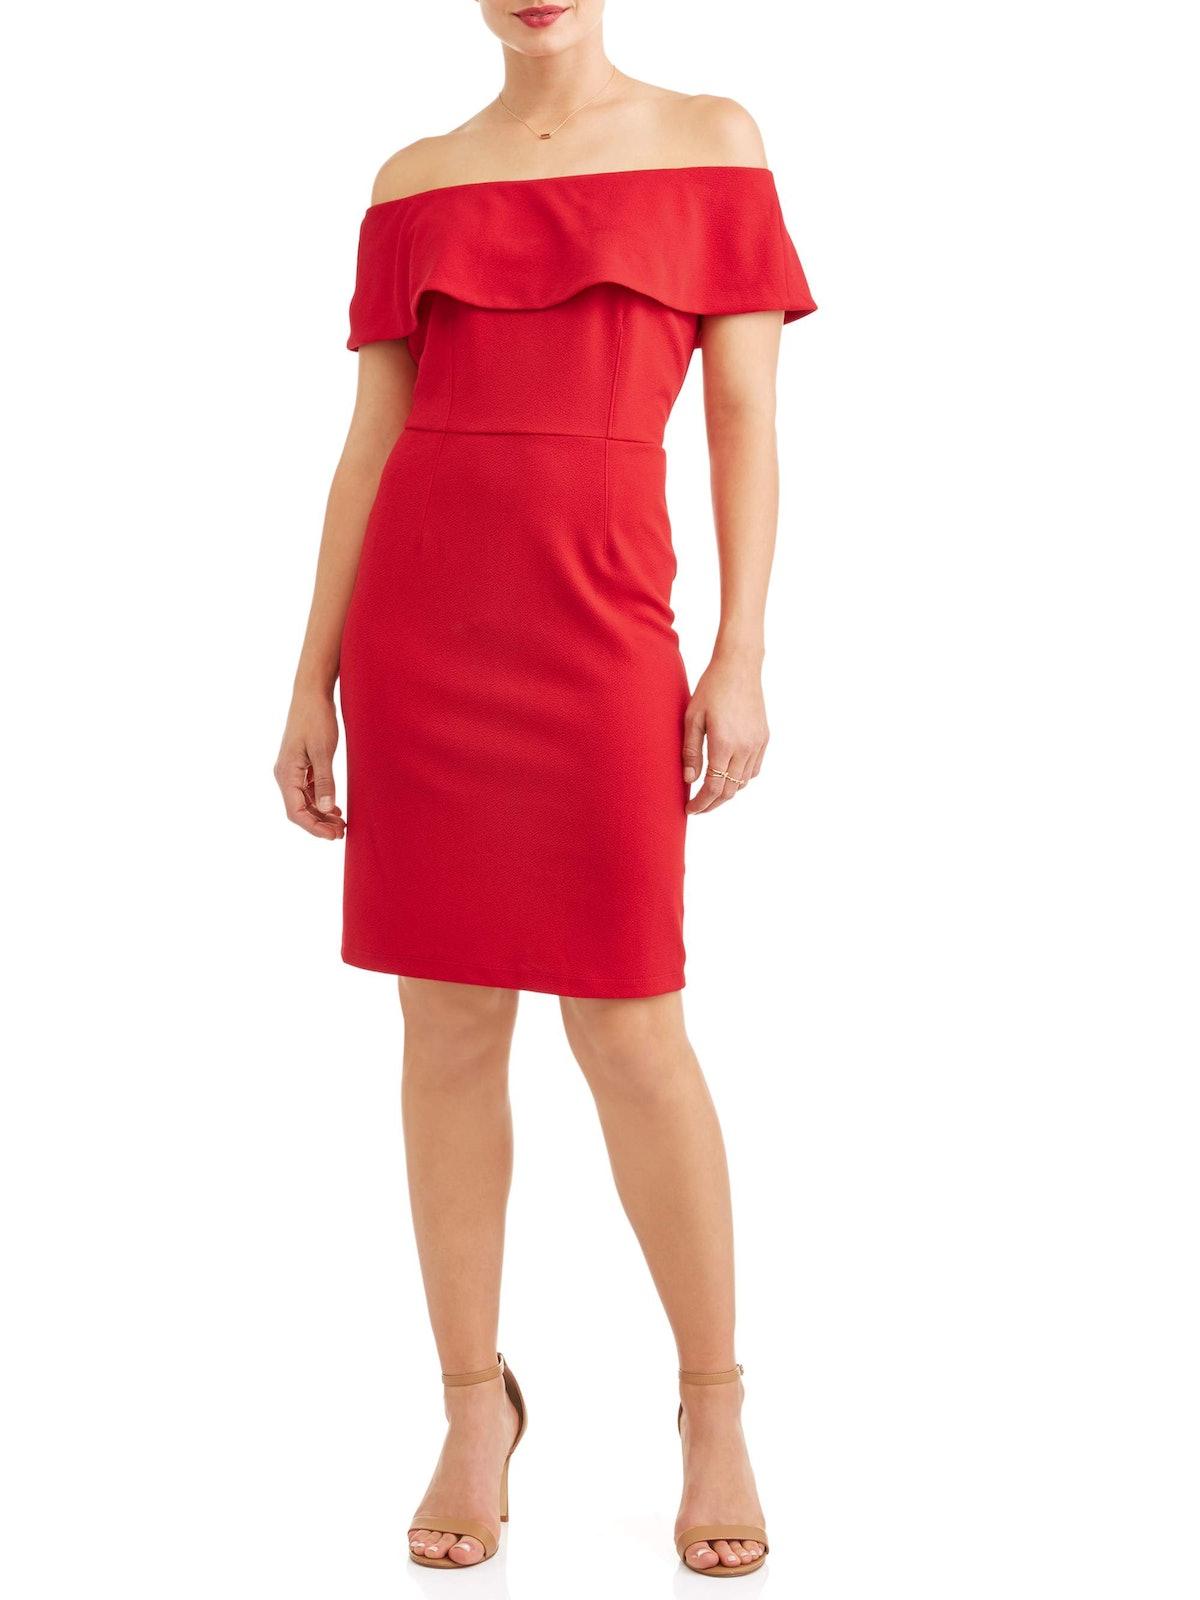 Wrapper Women's Ruffle Off the Shoulder Dress